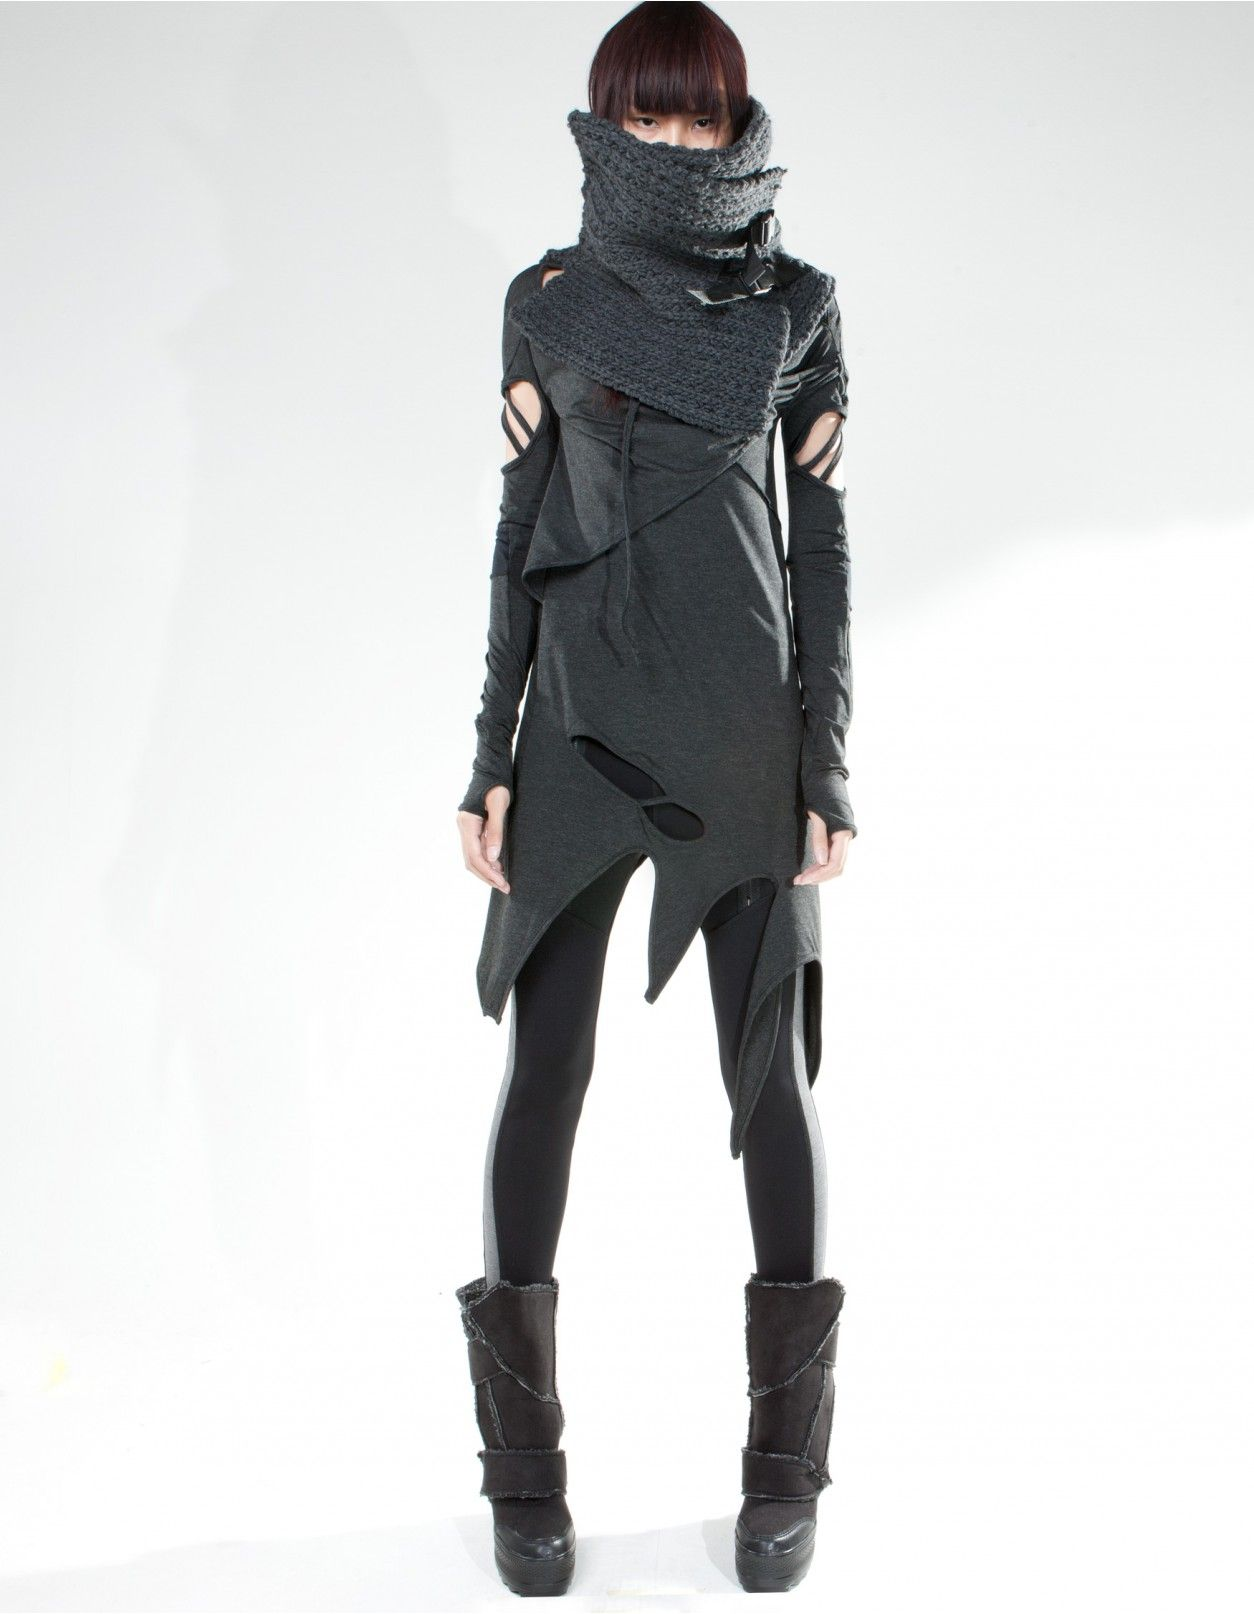 collar straps grey  accessories  demowoman  demobaza